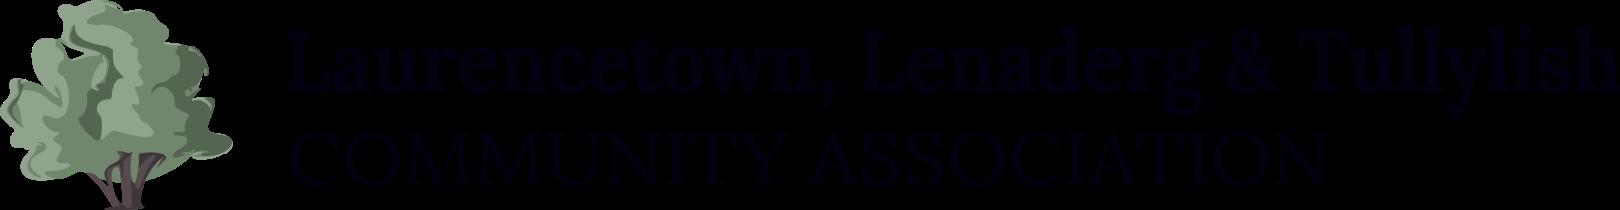 Laurencetown, Lenaderg & Tullylish Community Association